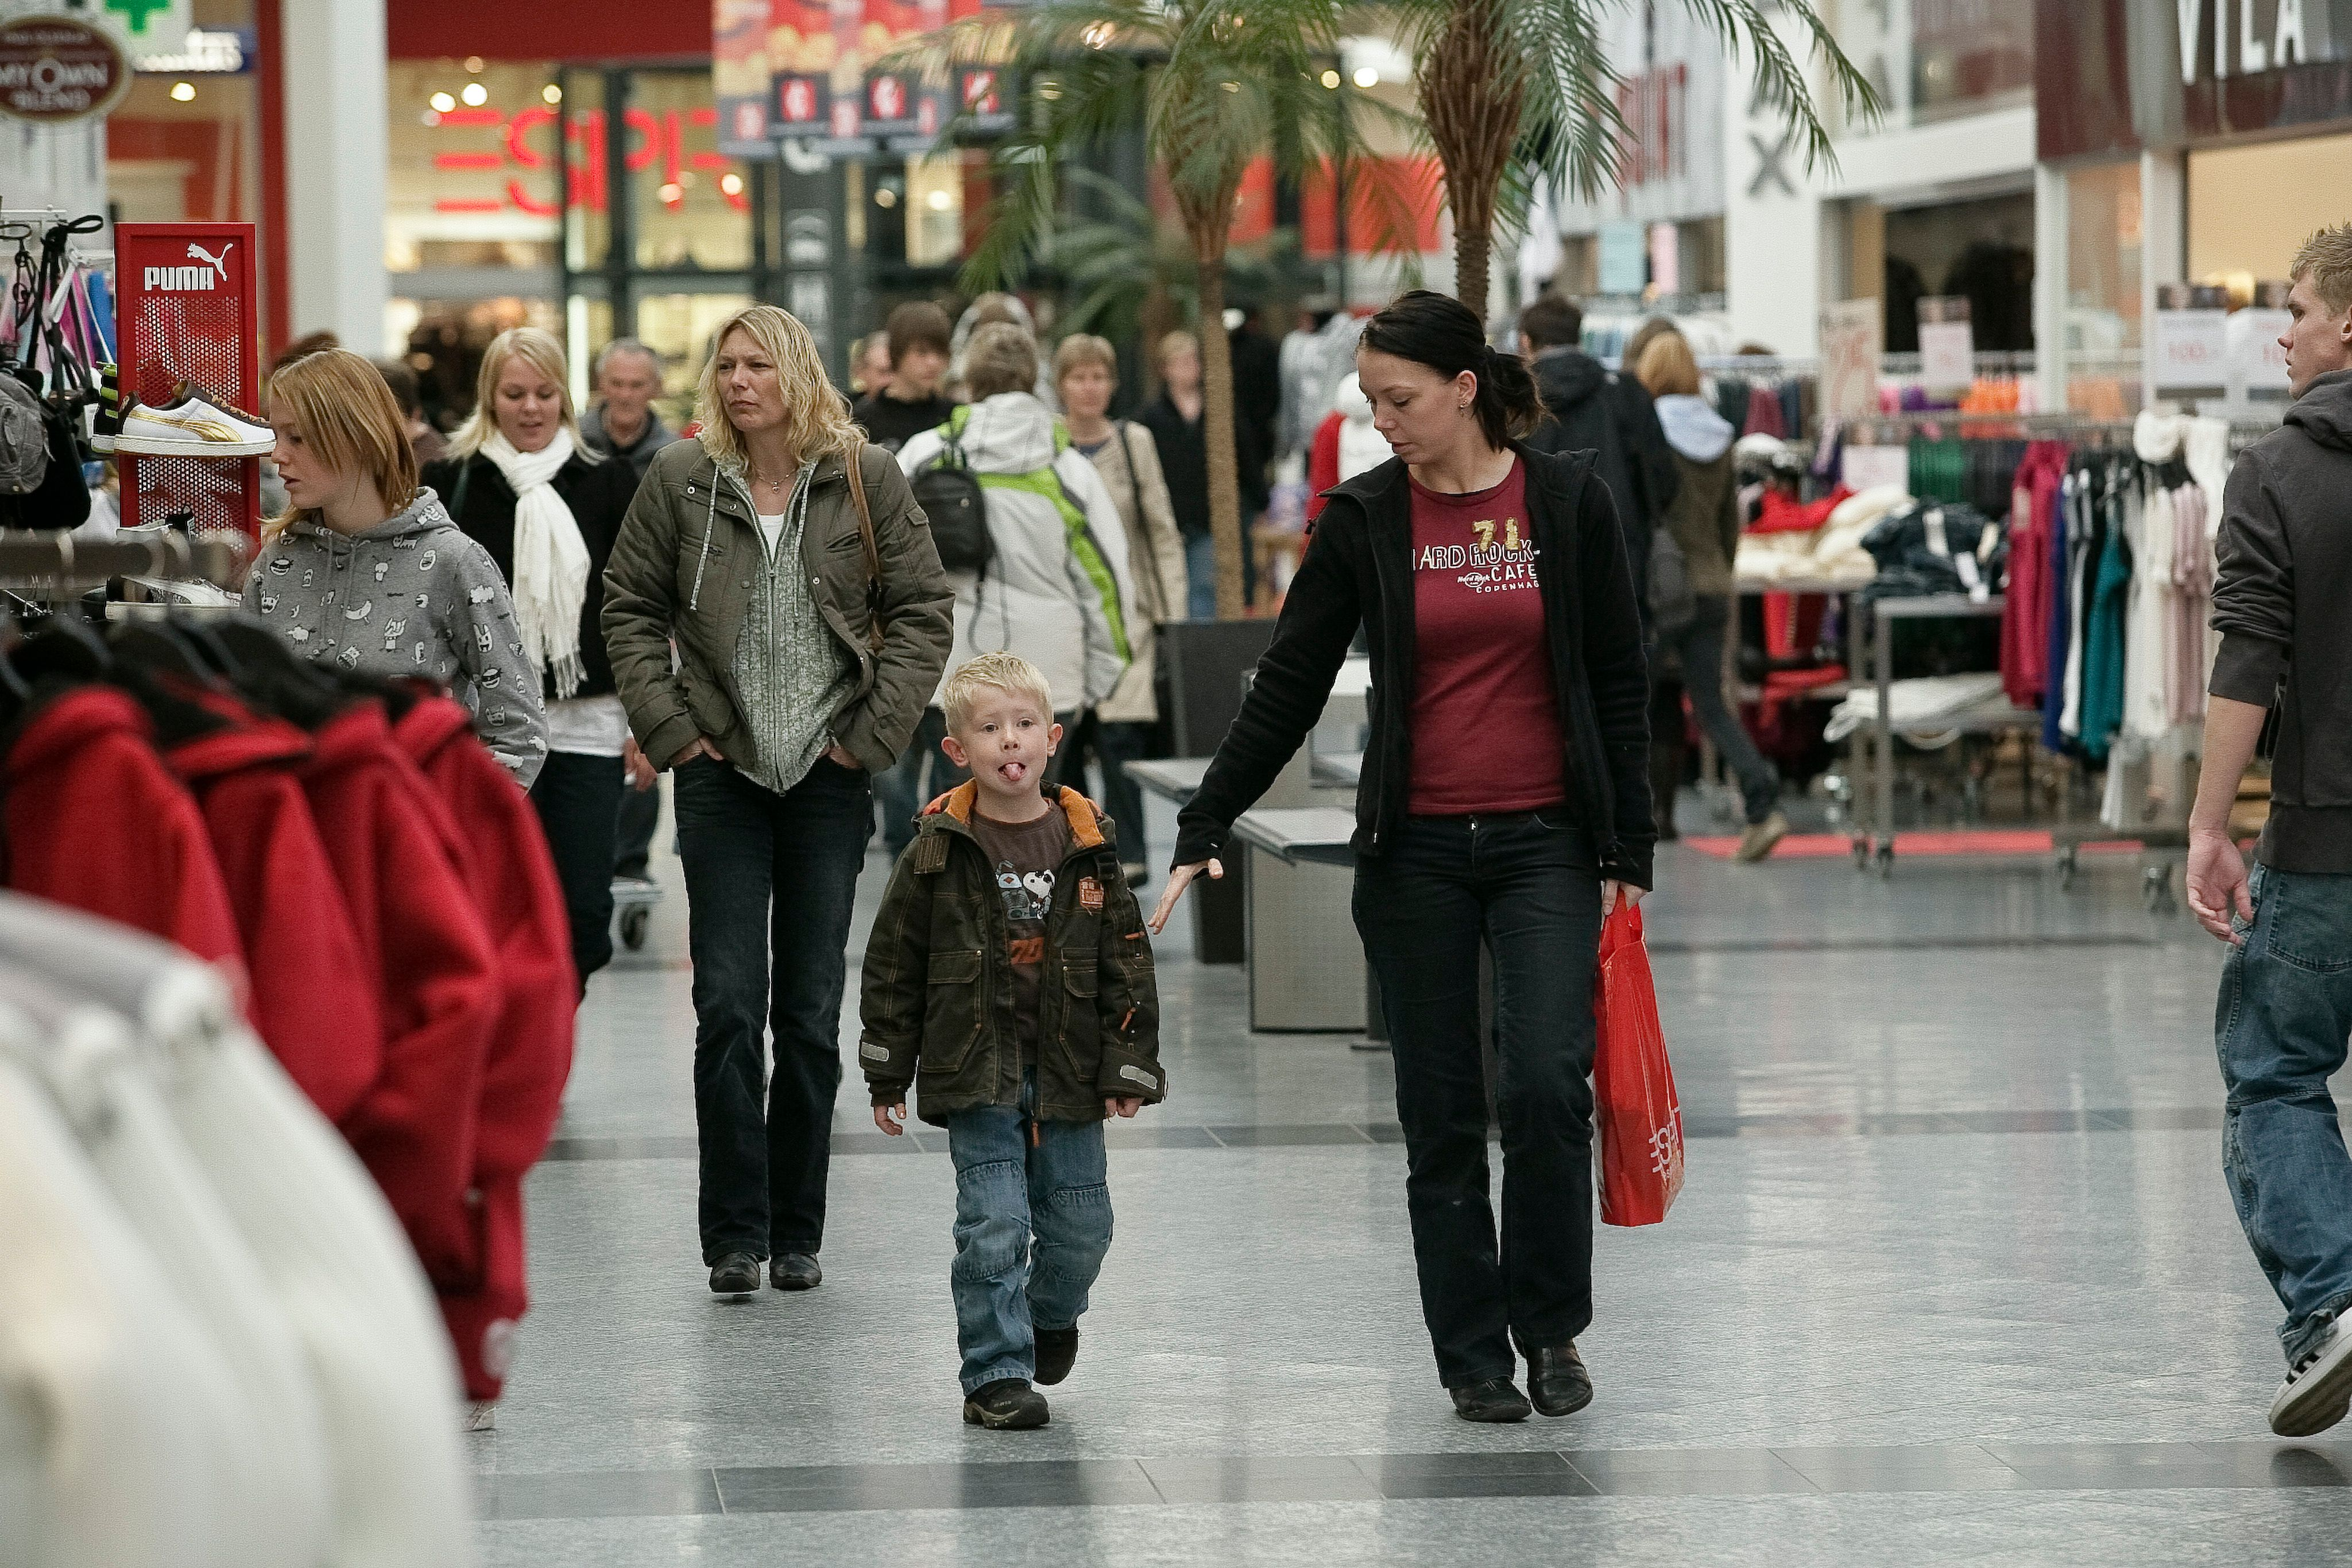 Image: Shopping center traffic (DK)